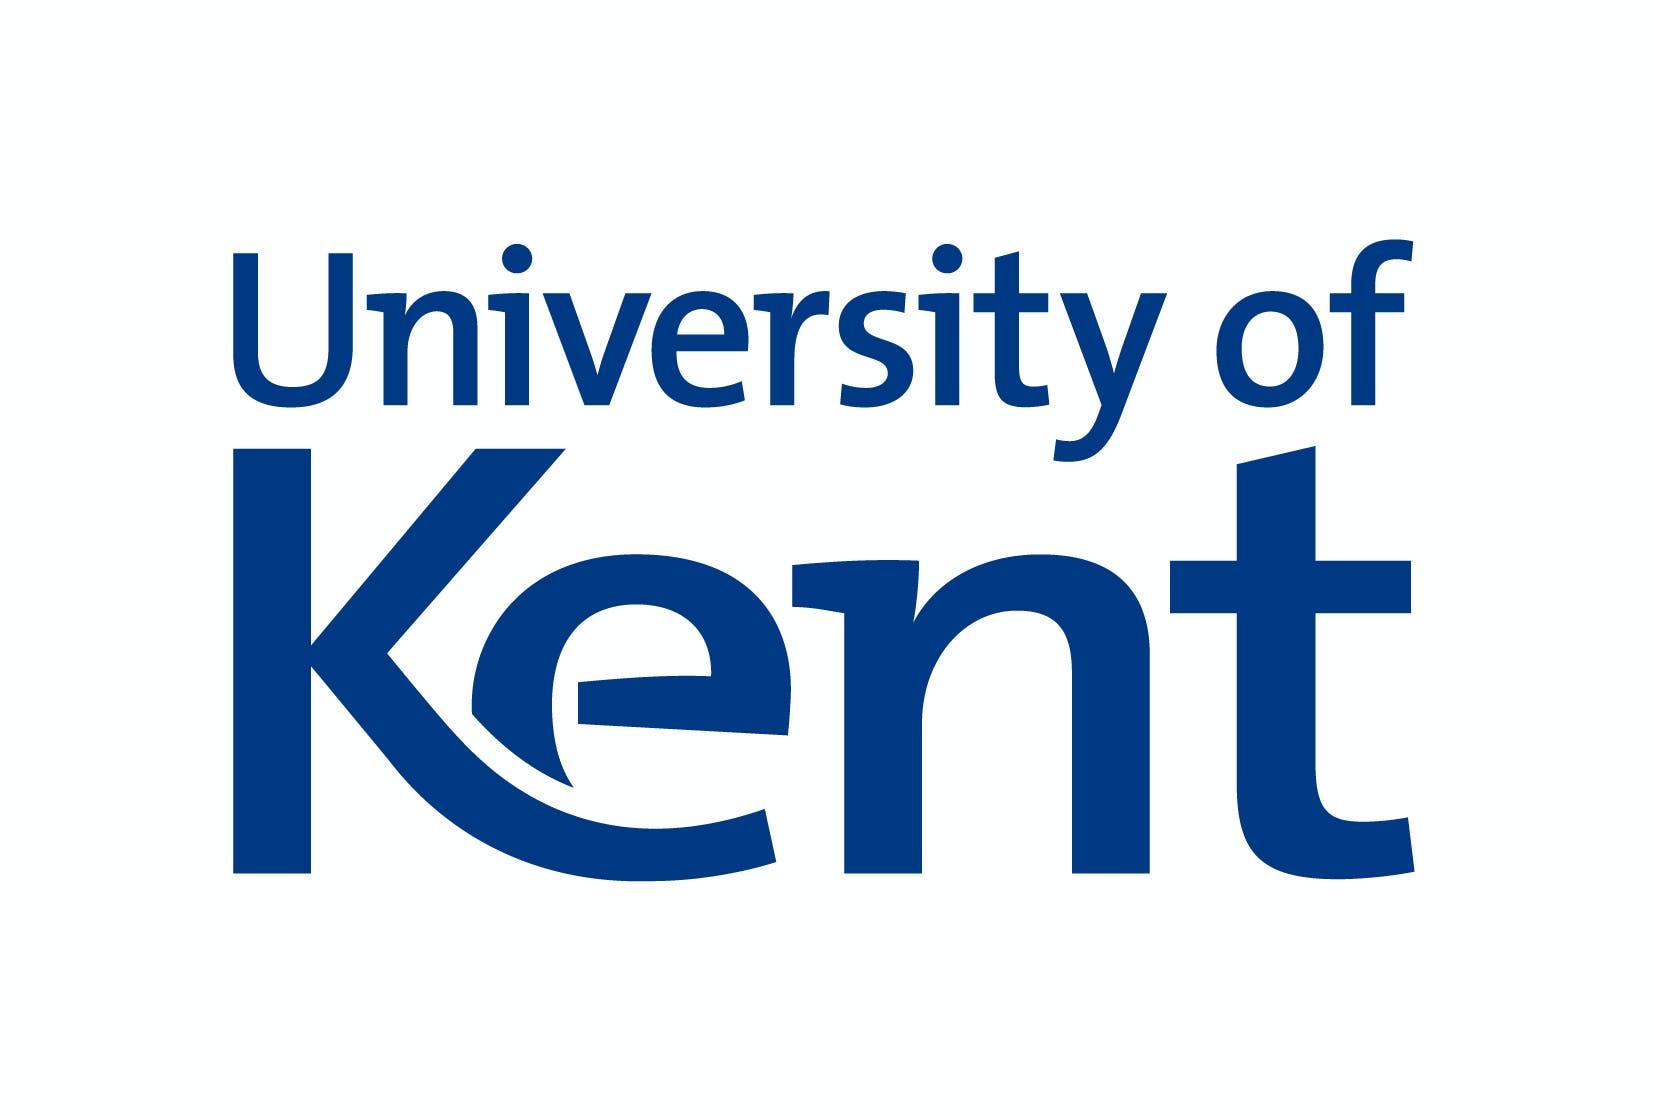 University of Kent | University Info | 277 Bachelors in English -  BachelorsPortal.com